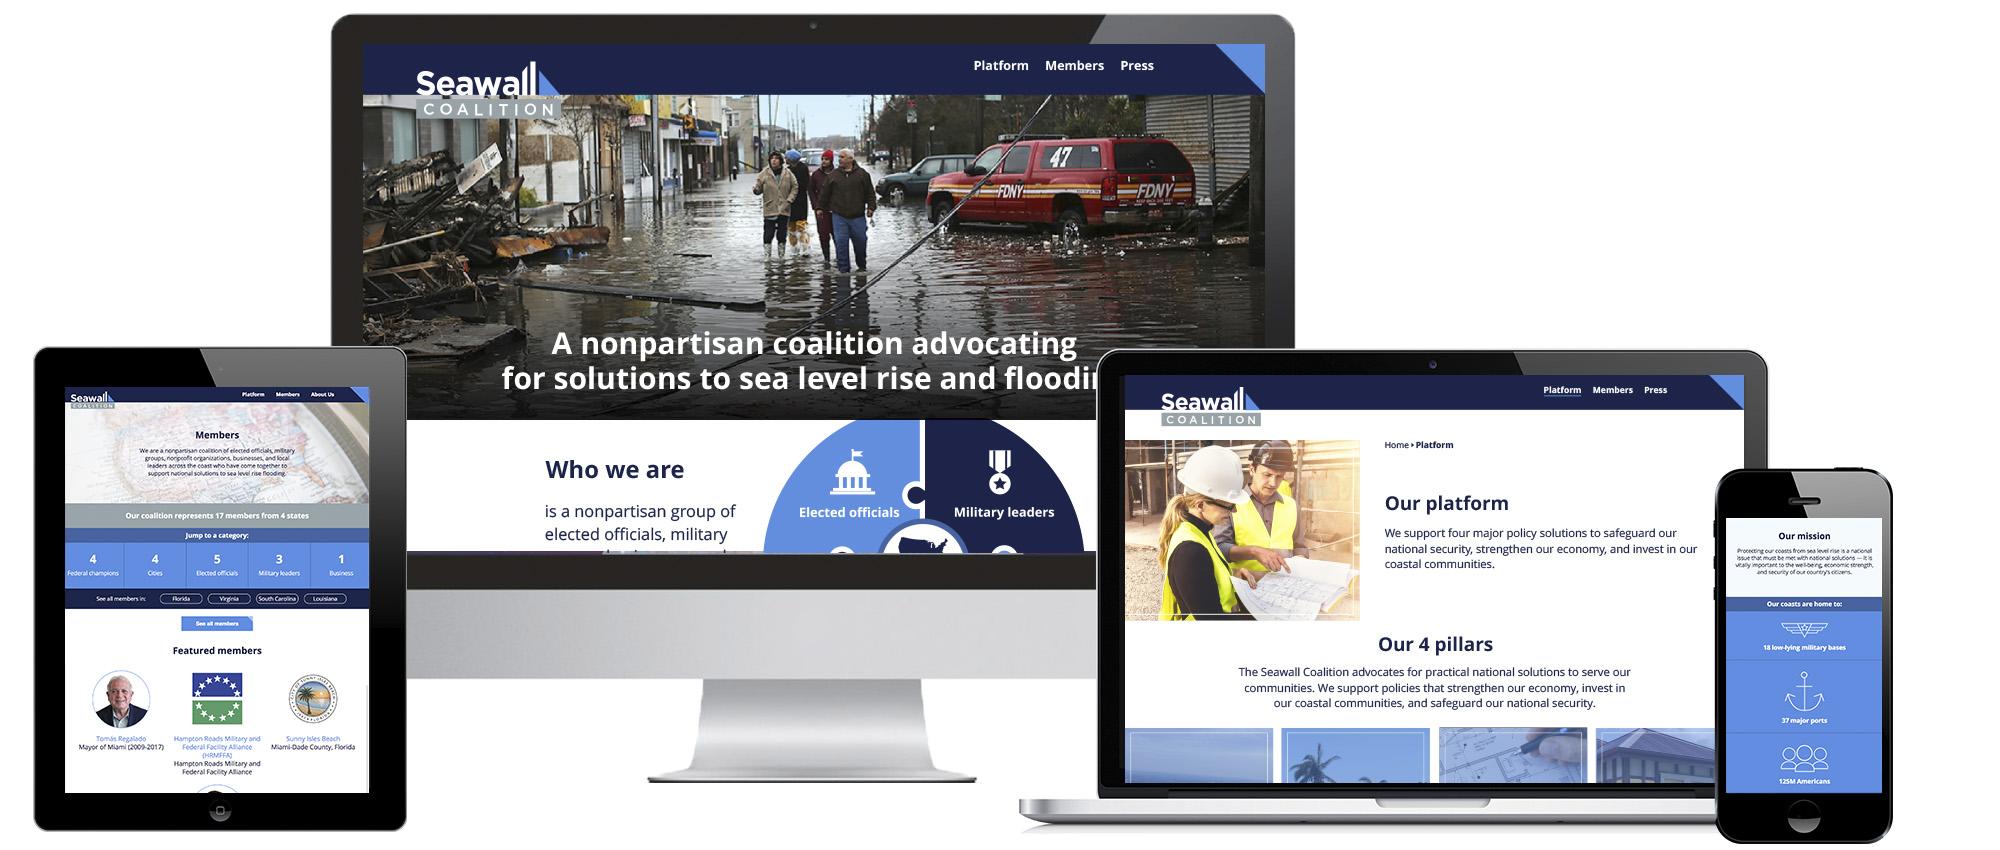 SWC website.jpg